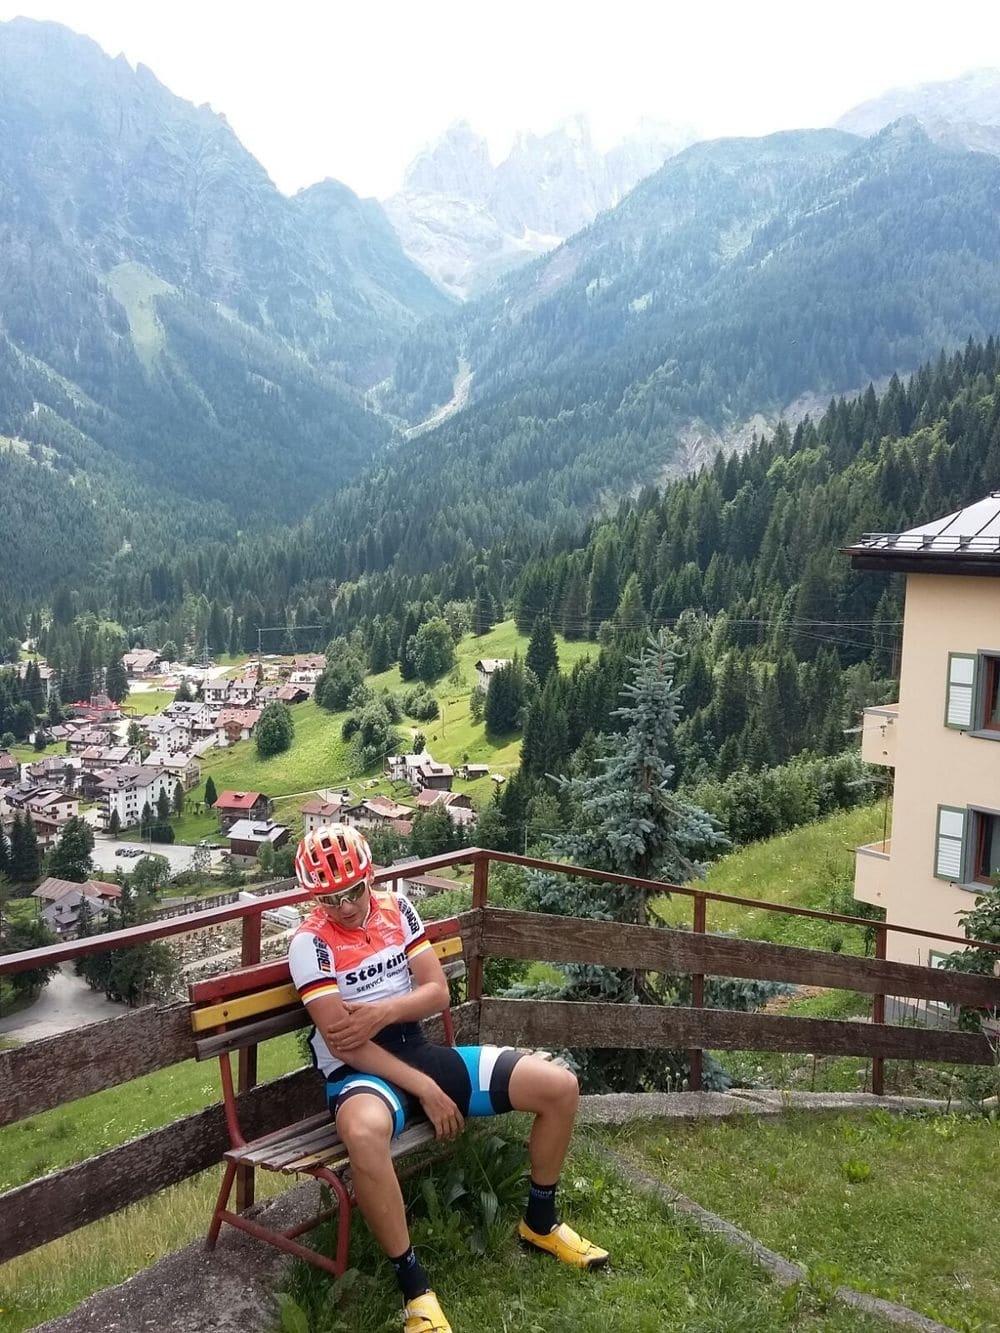 Höhentrainingslager in den Dolomiten